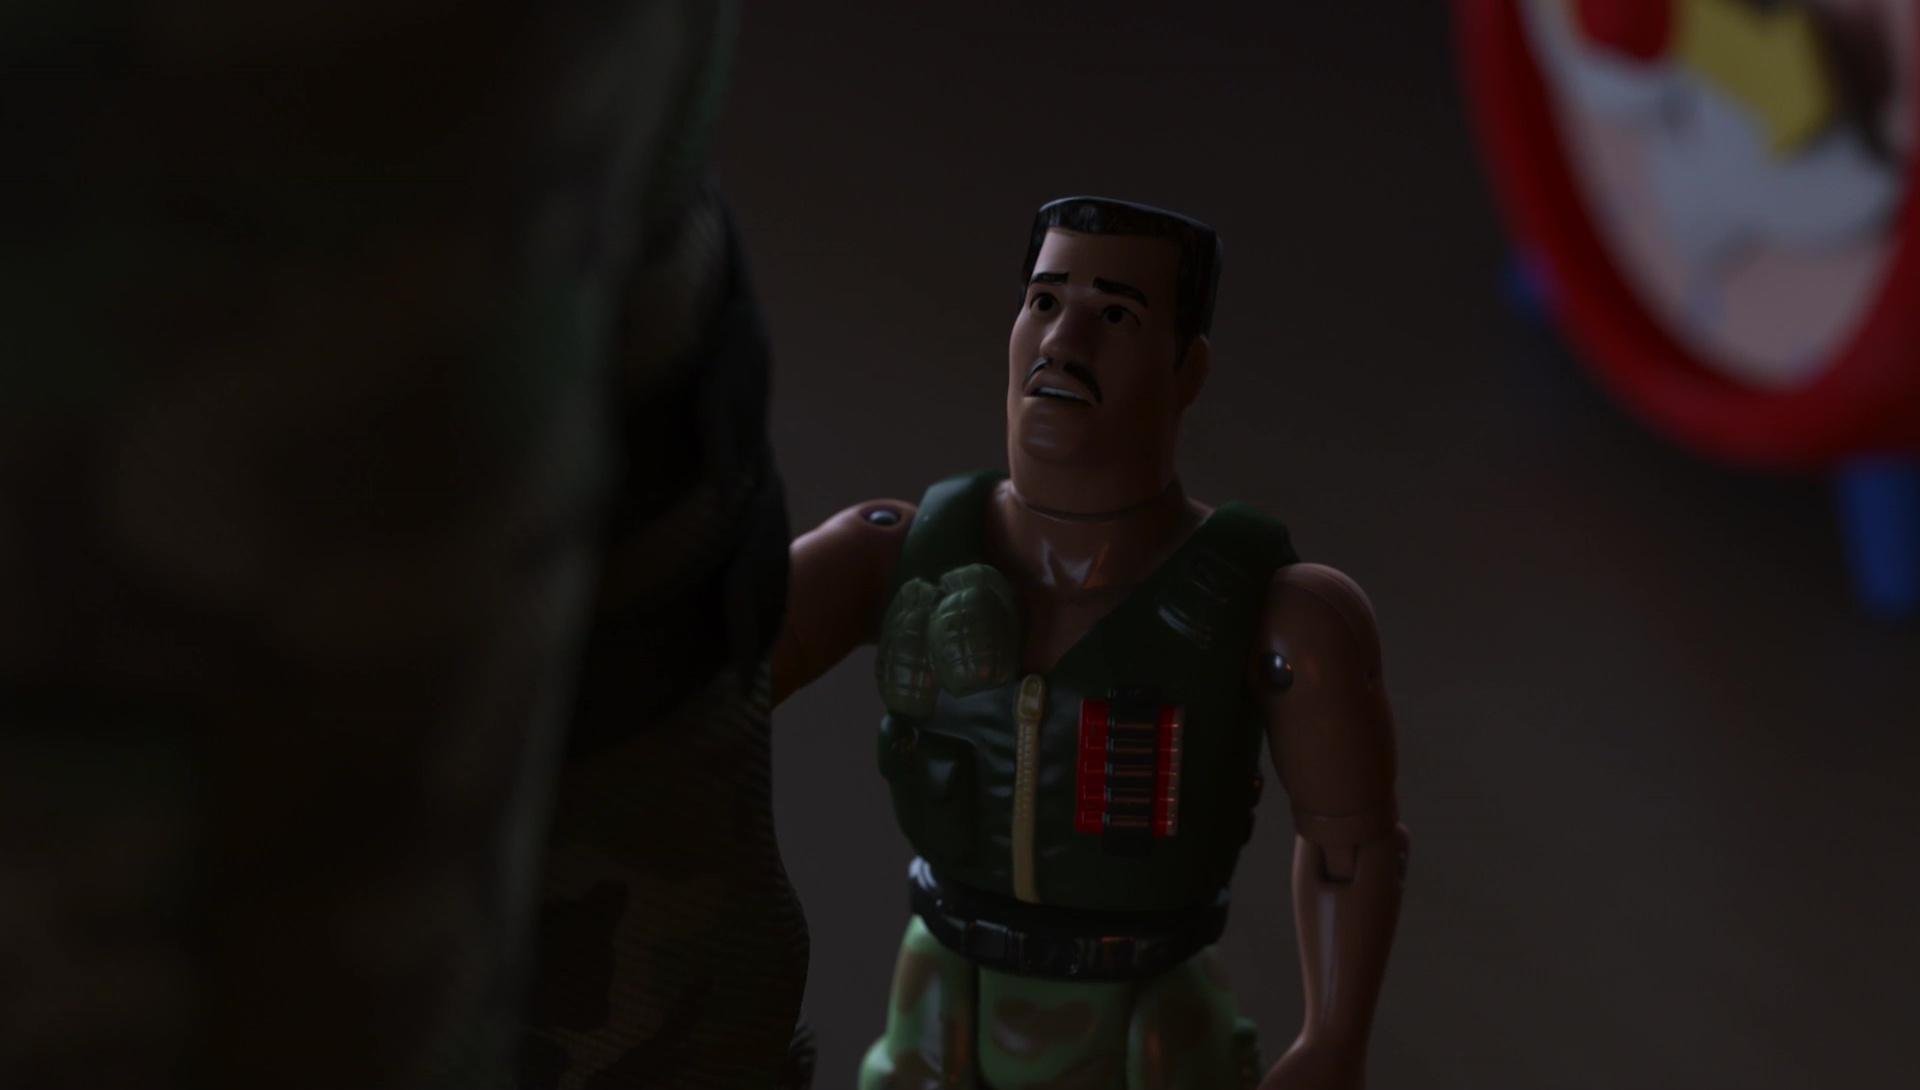 commandant carl junior combat personnage character pixar disney toy story angoisse motel terror